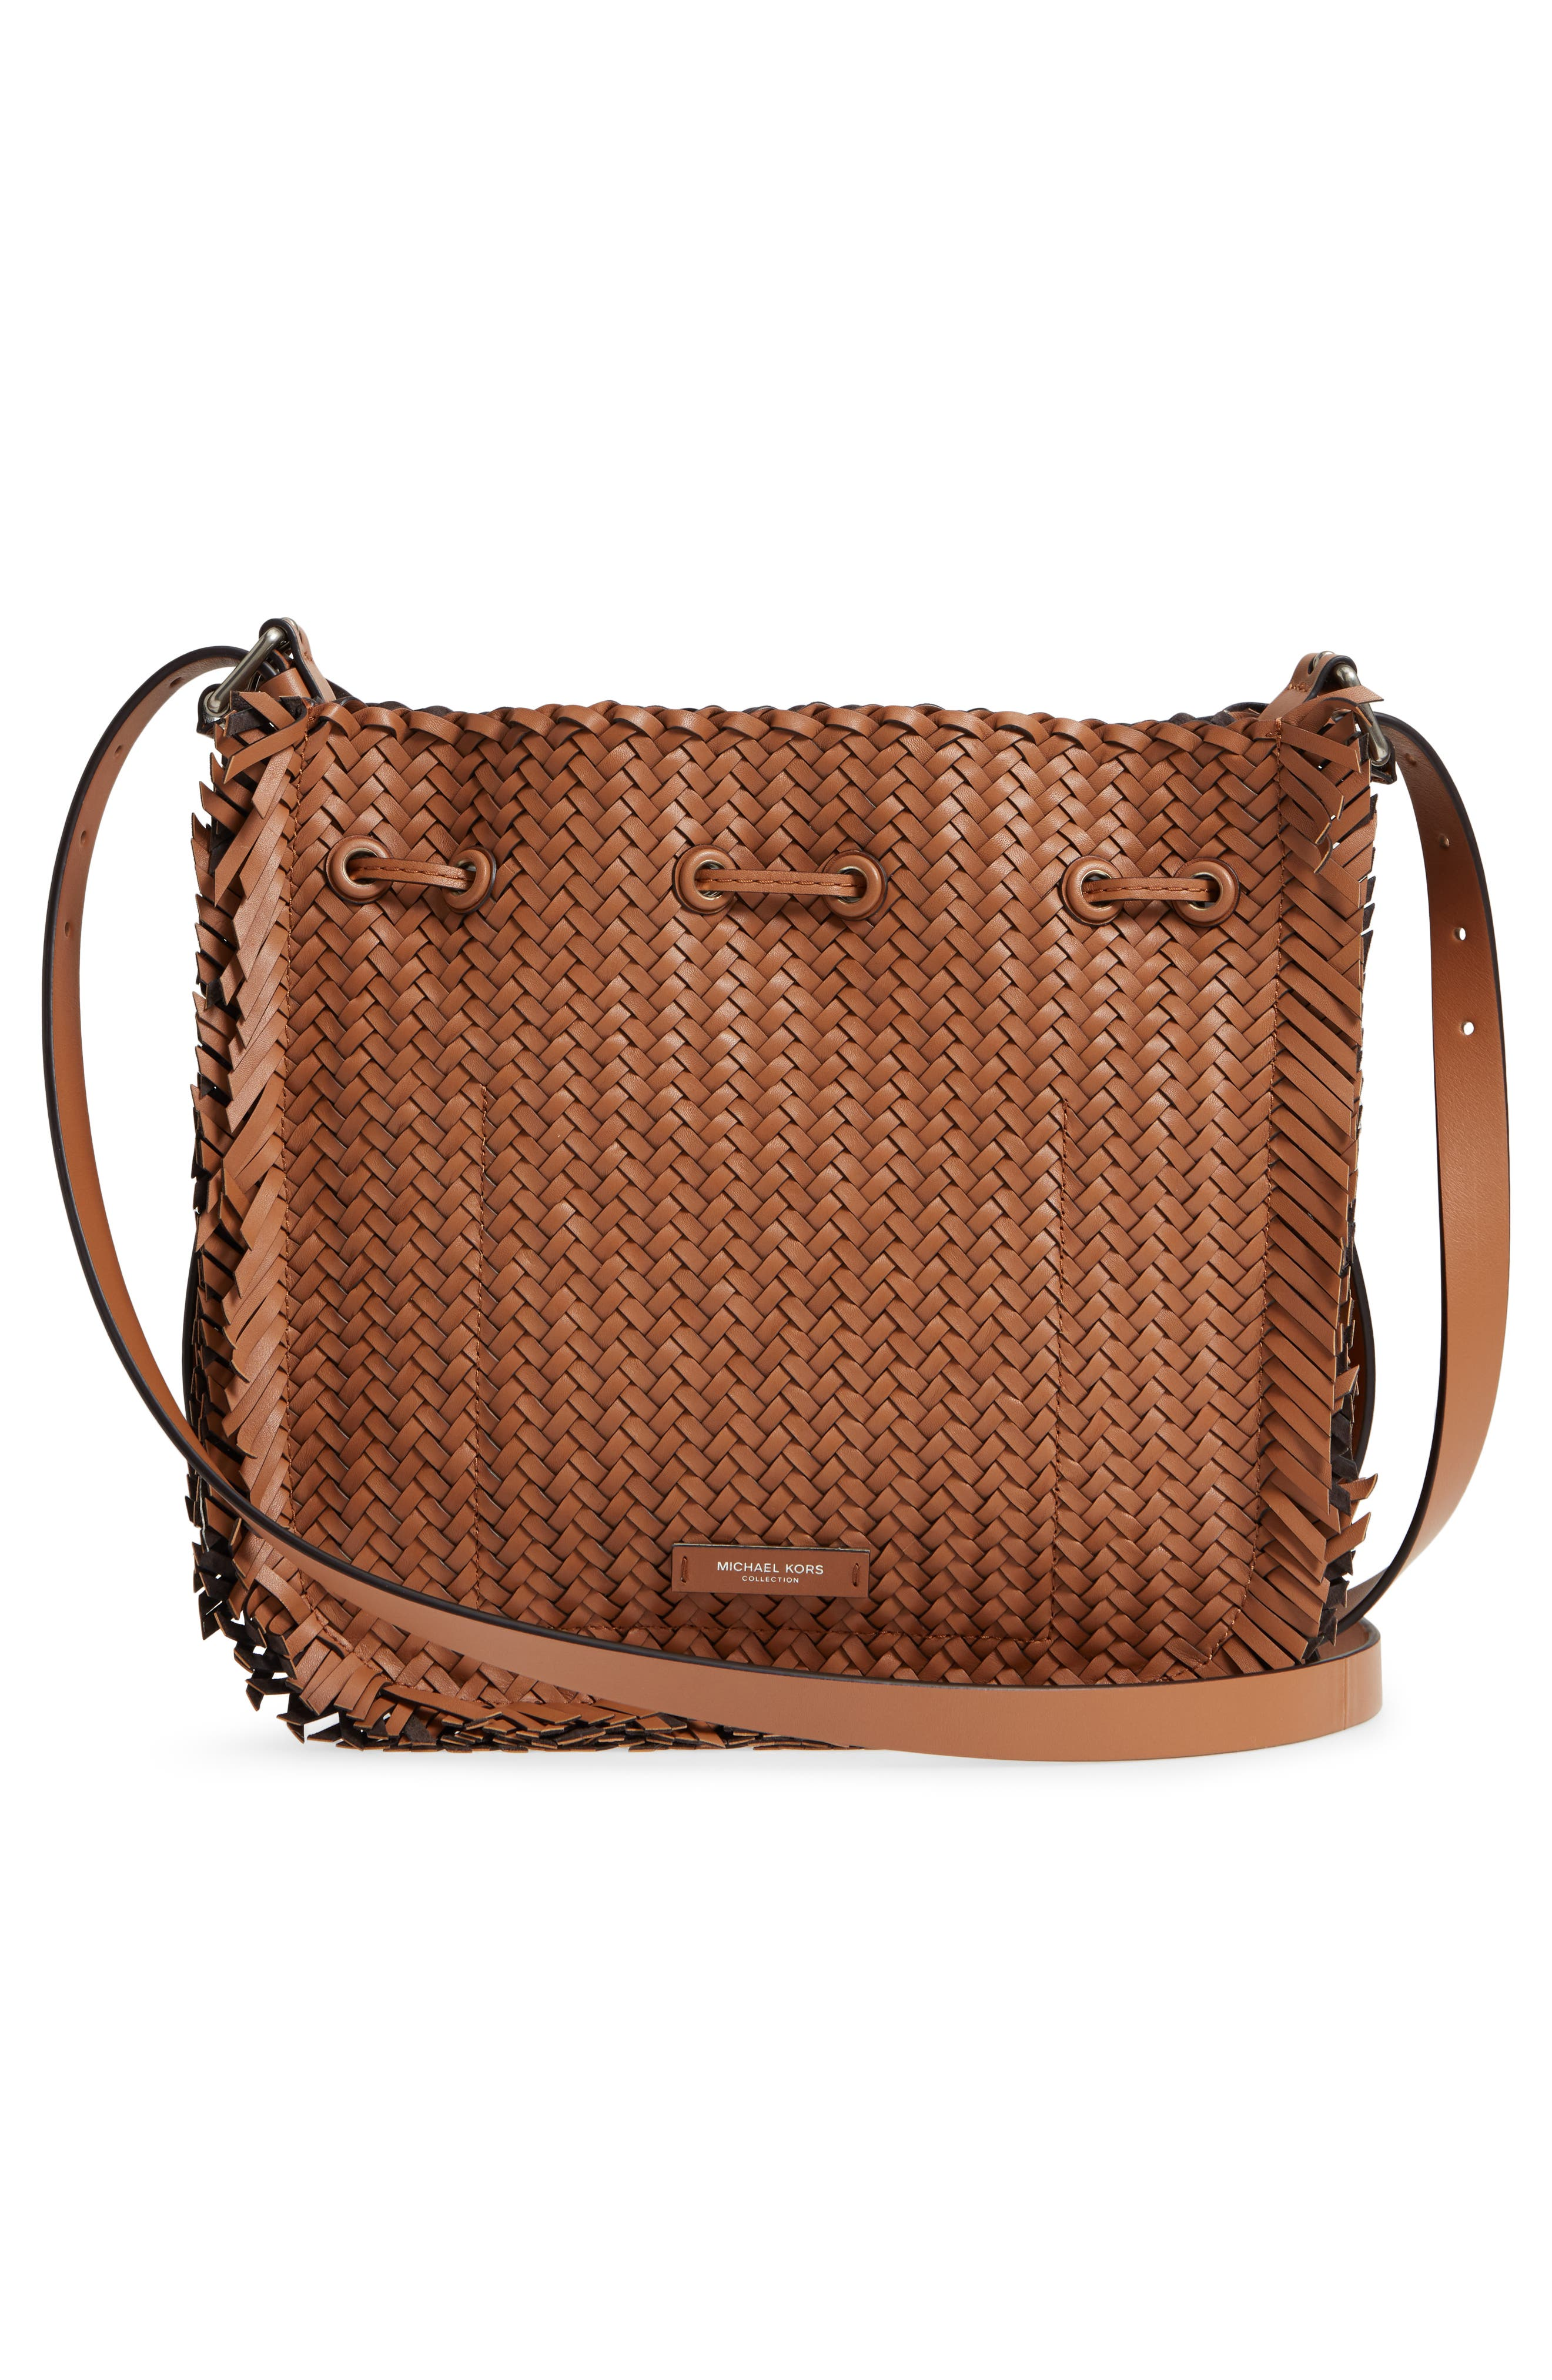 Maldives Woven Frayed Leather Crossbody Bag,                             Alternate thumbnail 3, color,                             231